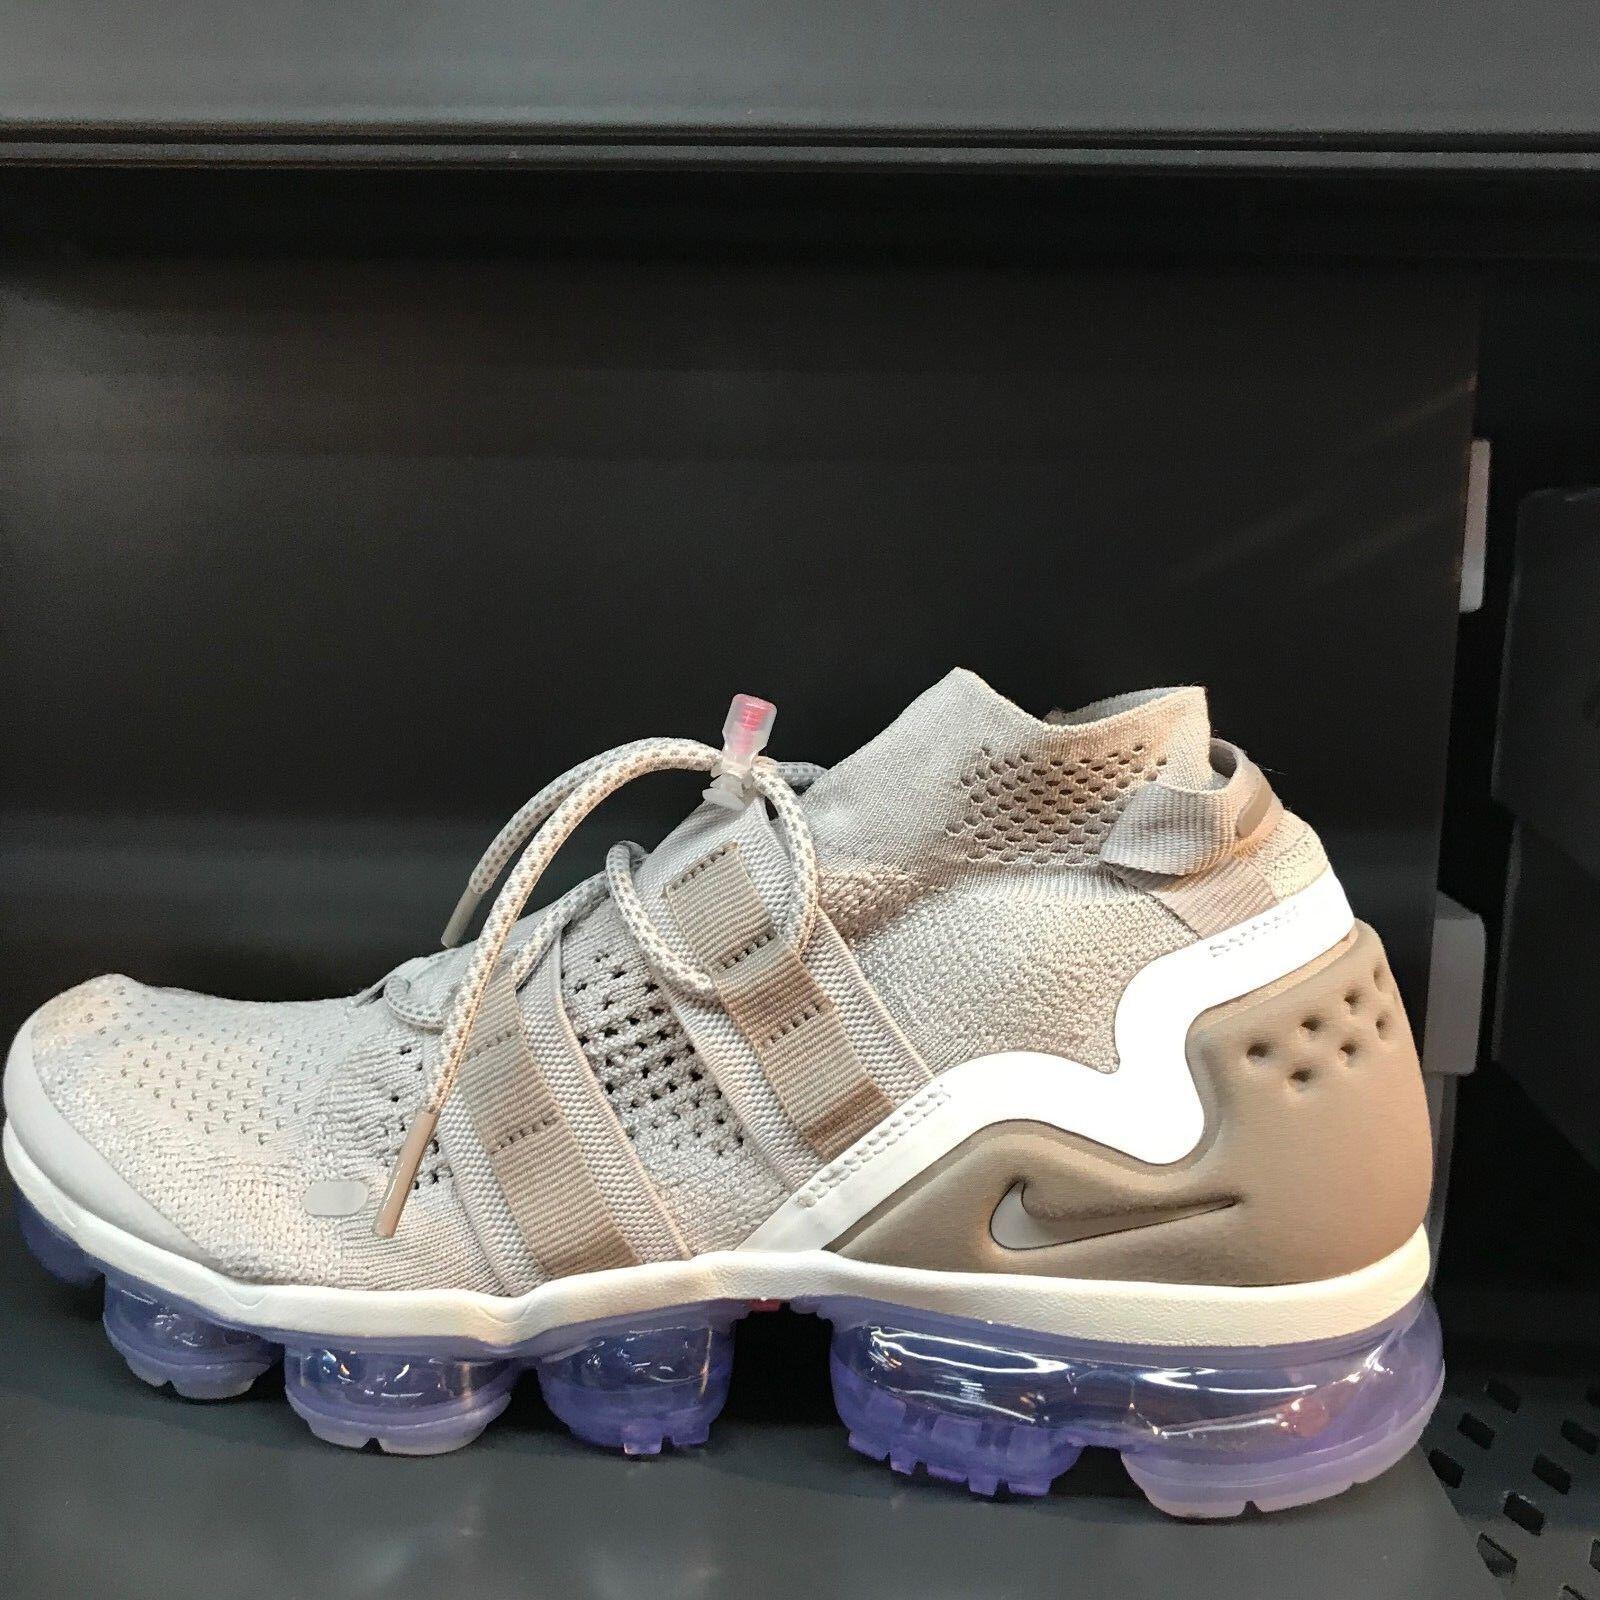 46a4e718e22 Nike Air Vapormax Flyknit FK Utility Moon Particle shoes AH6834-205 Size 7 -11